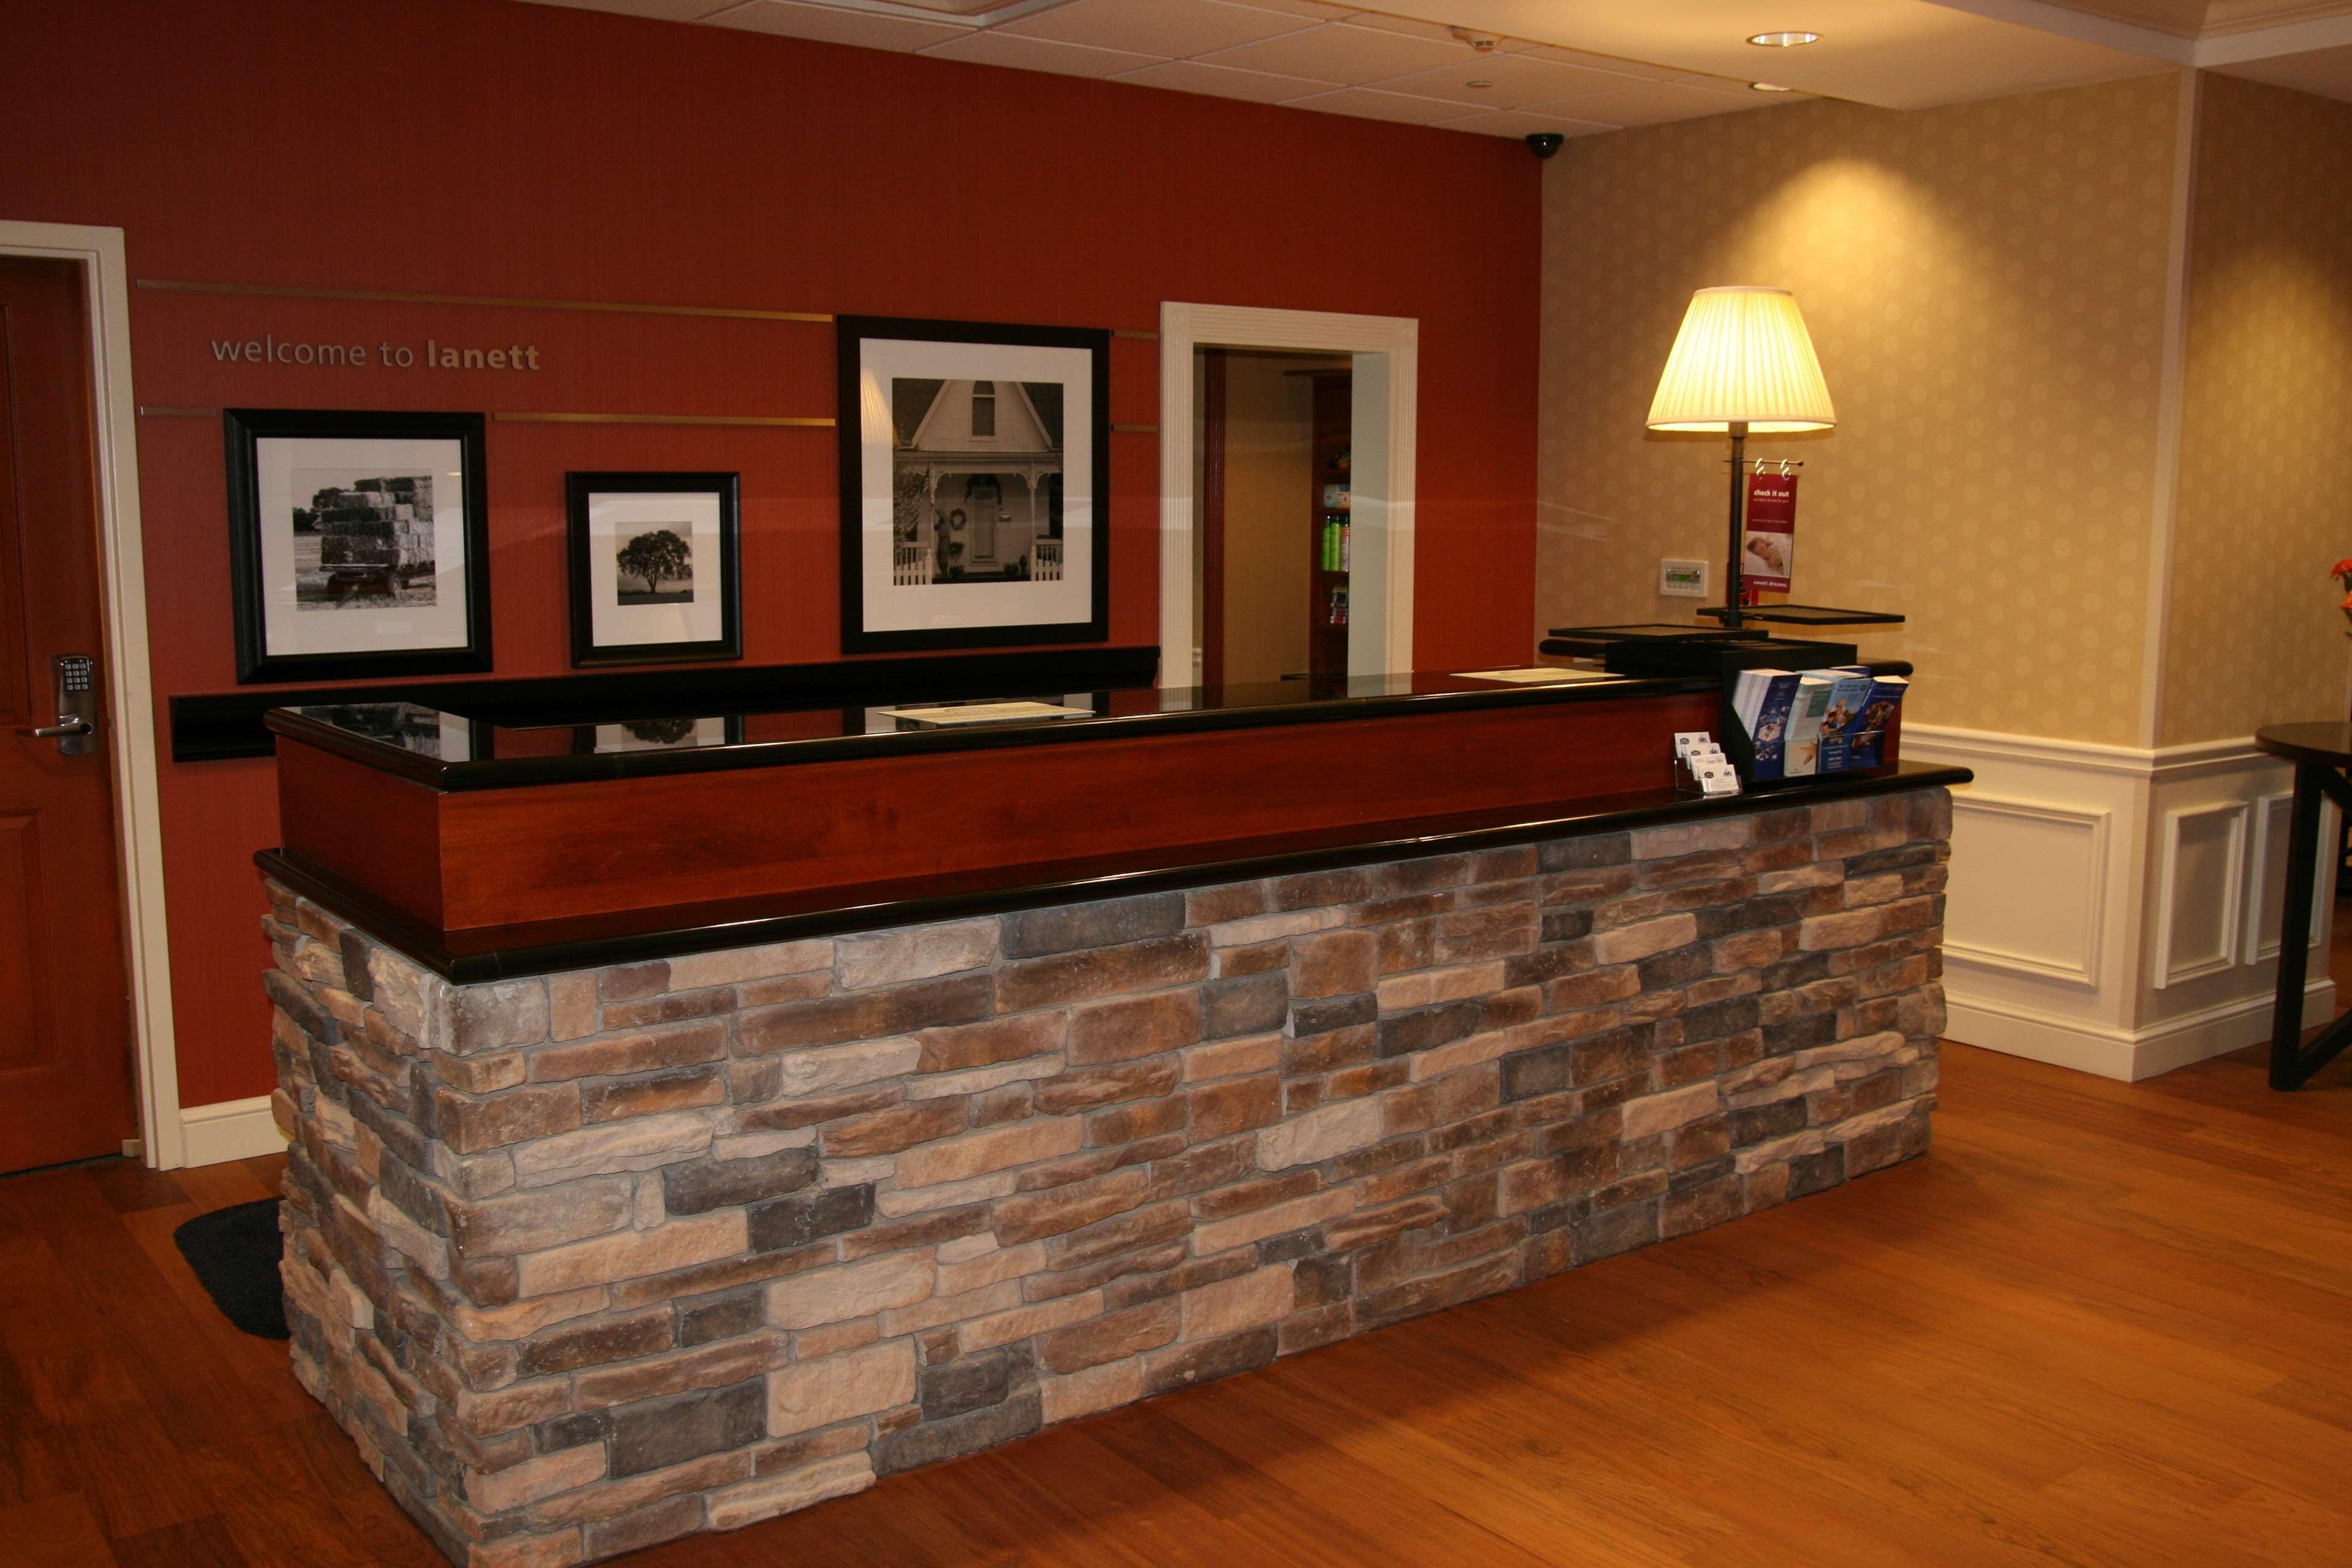 Hampton Inn & Suites Lanett-West Point image 3